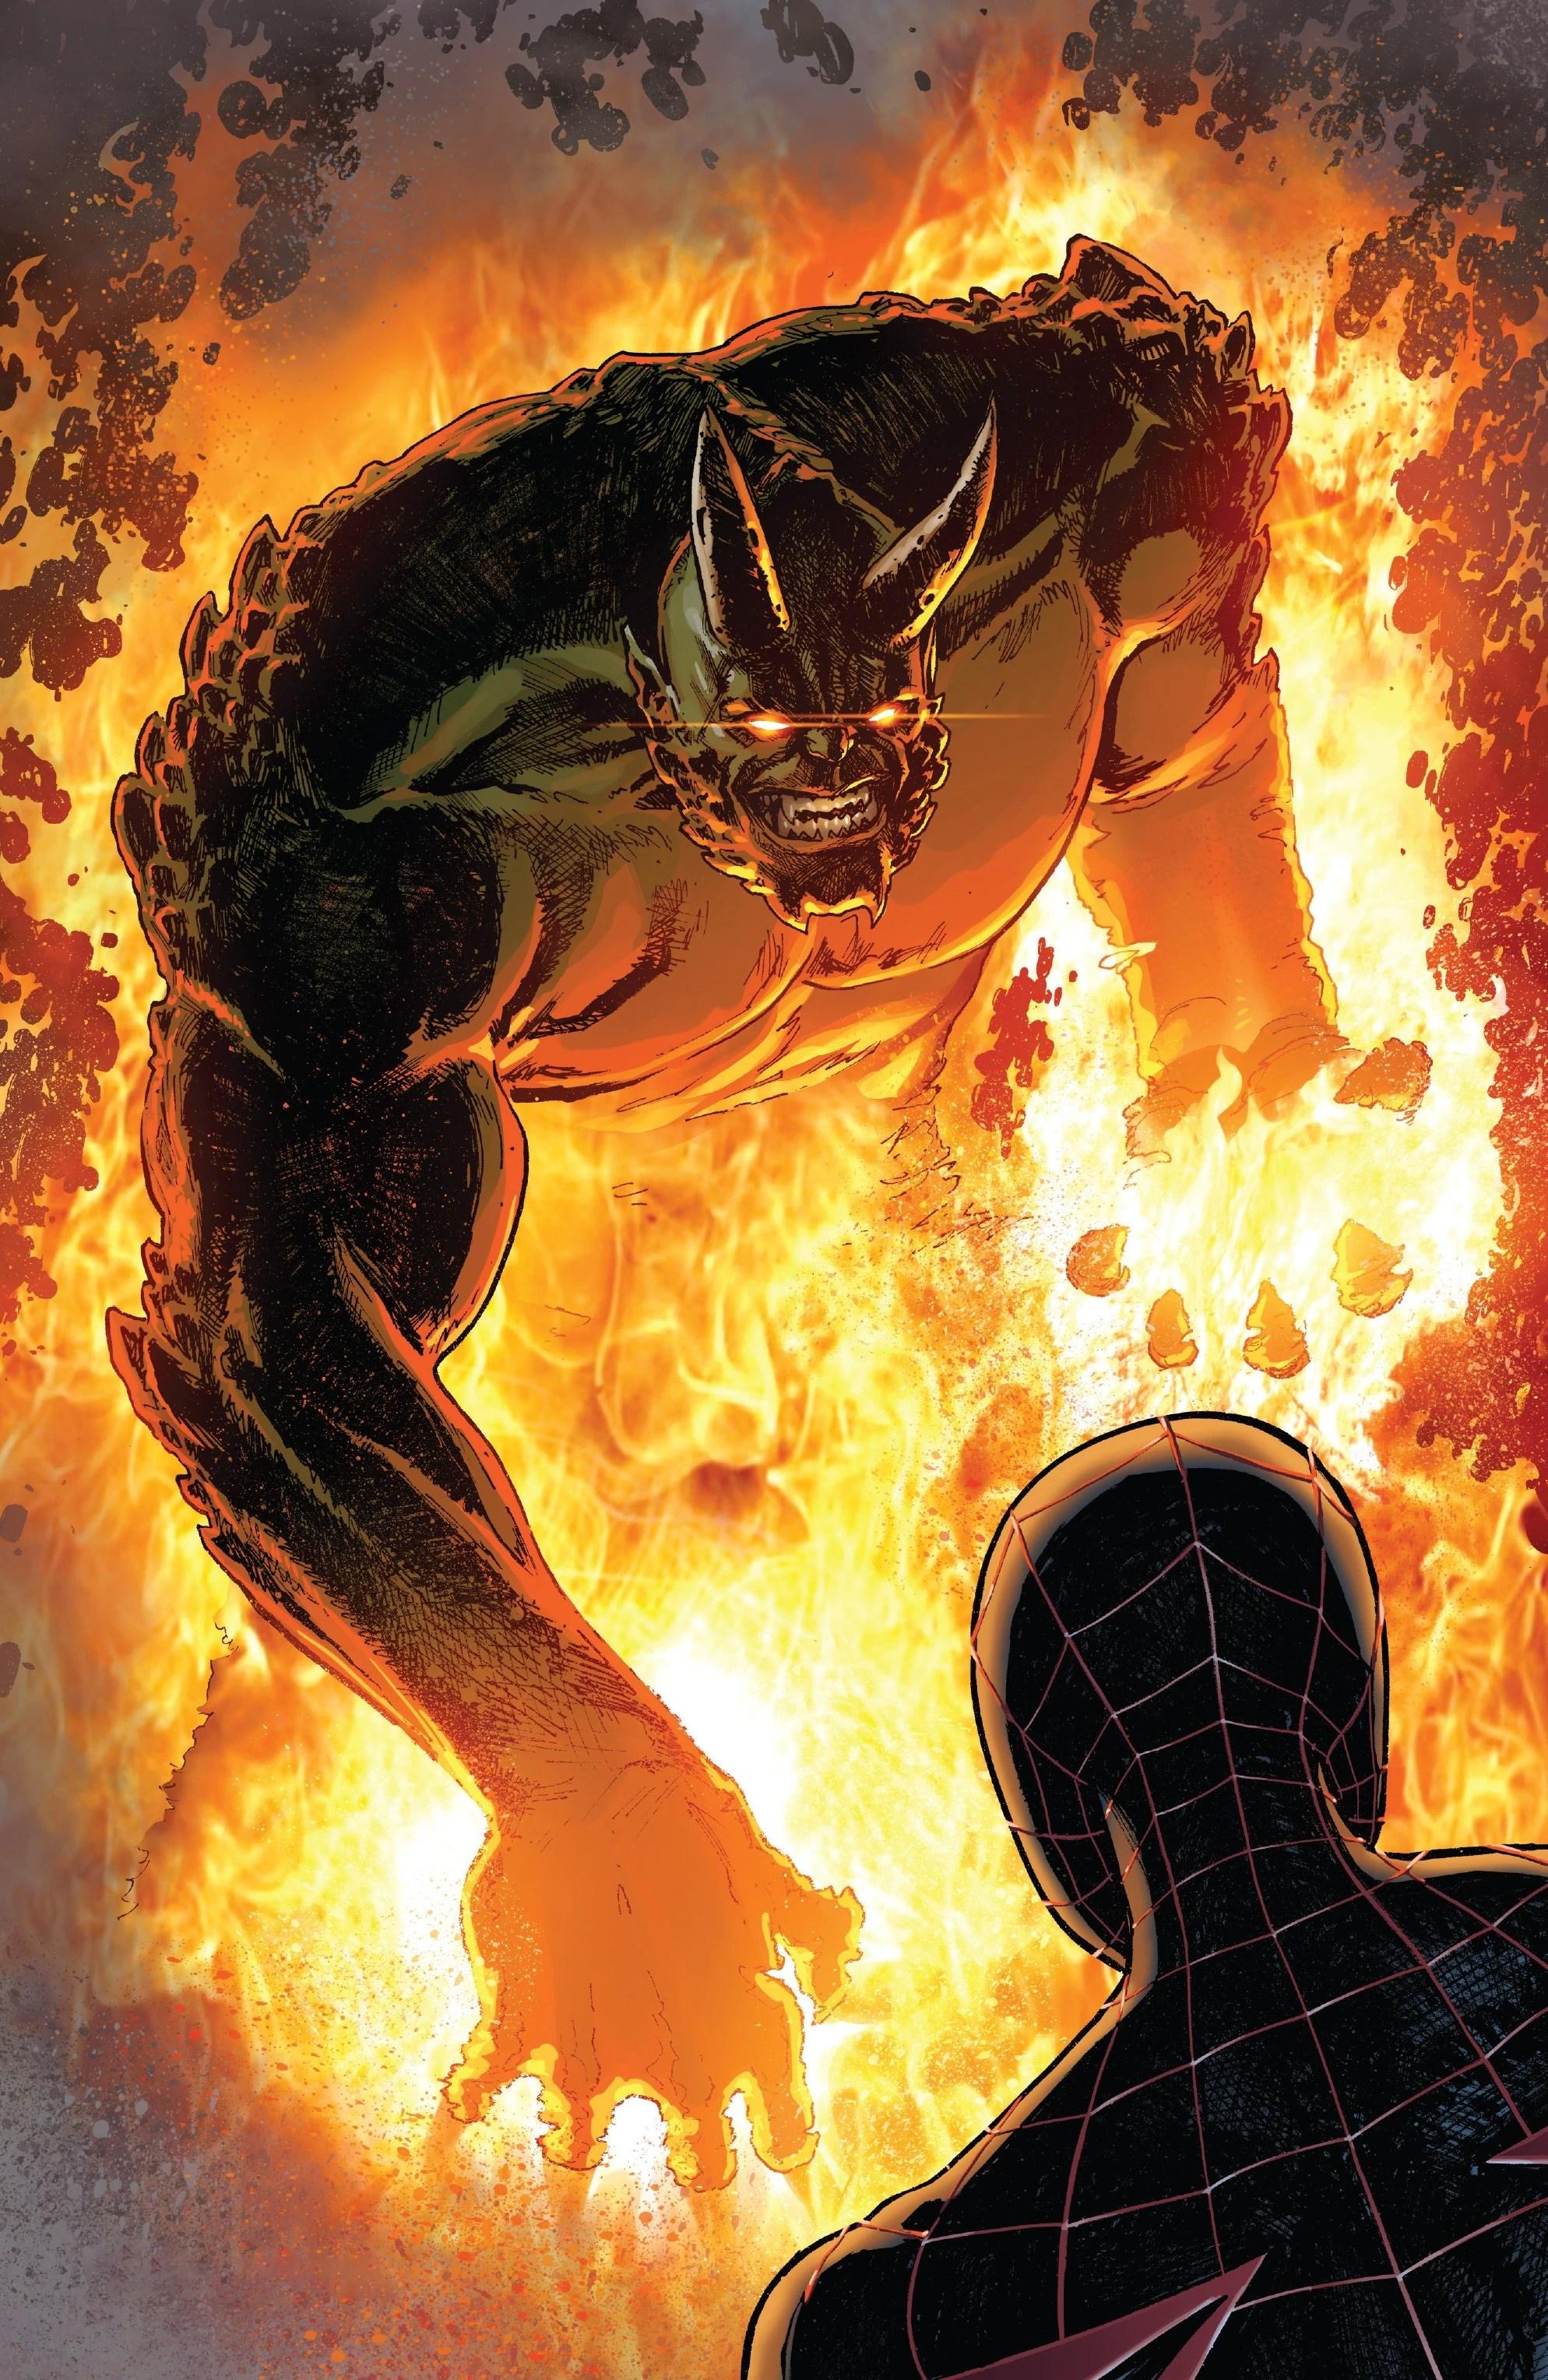 Spiderman Surrogate Father : spiderman, surrogate, father, Norman, Osborn, (Earth-1610), Marvel, Database, Fandom